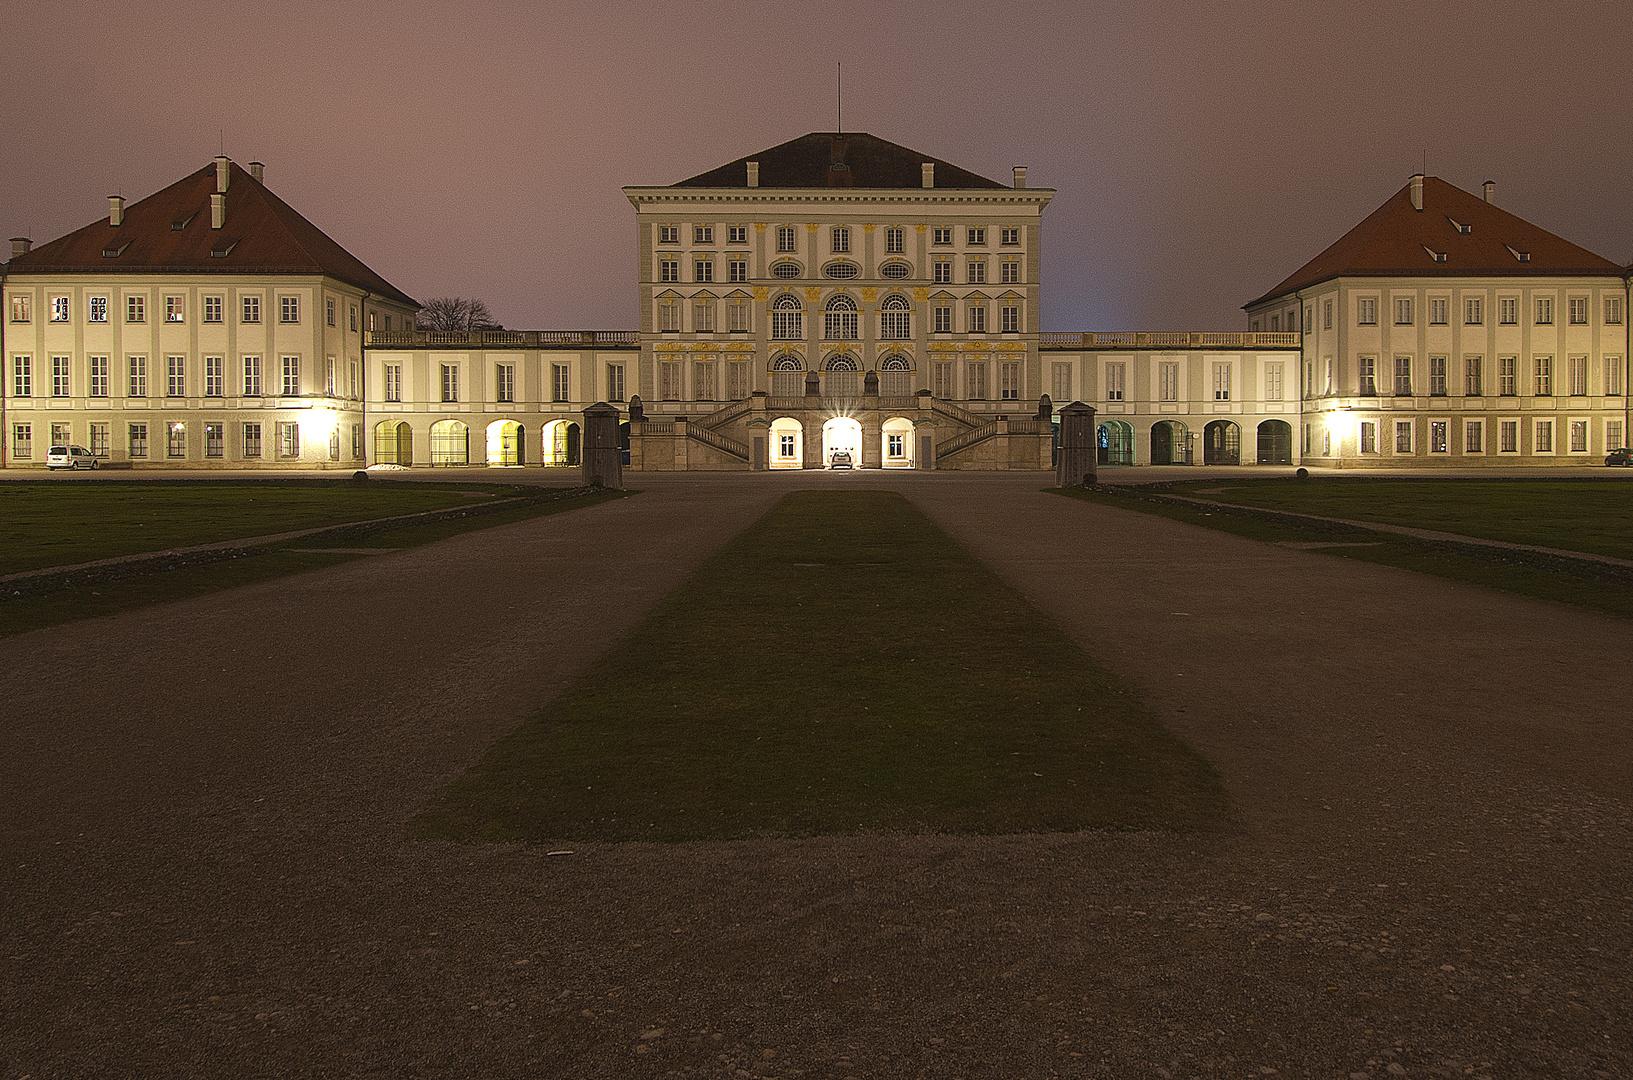 Nymphenburger Schloss München